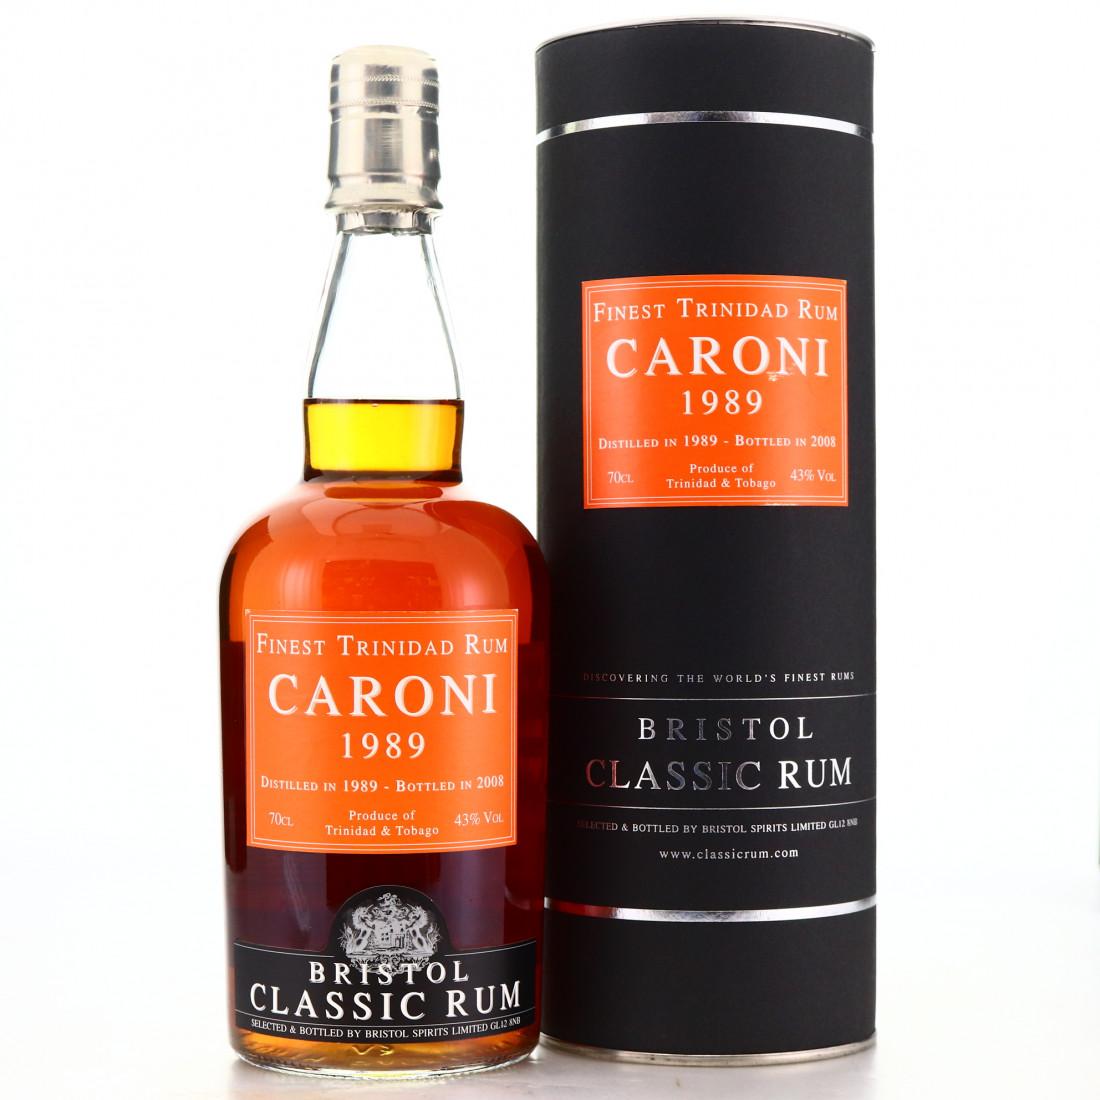 Caroni 1989 Bristol Classic